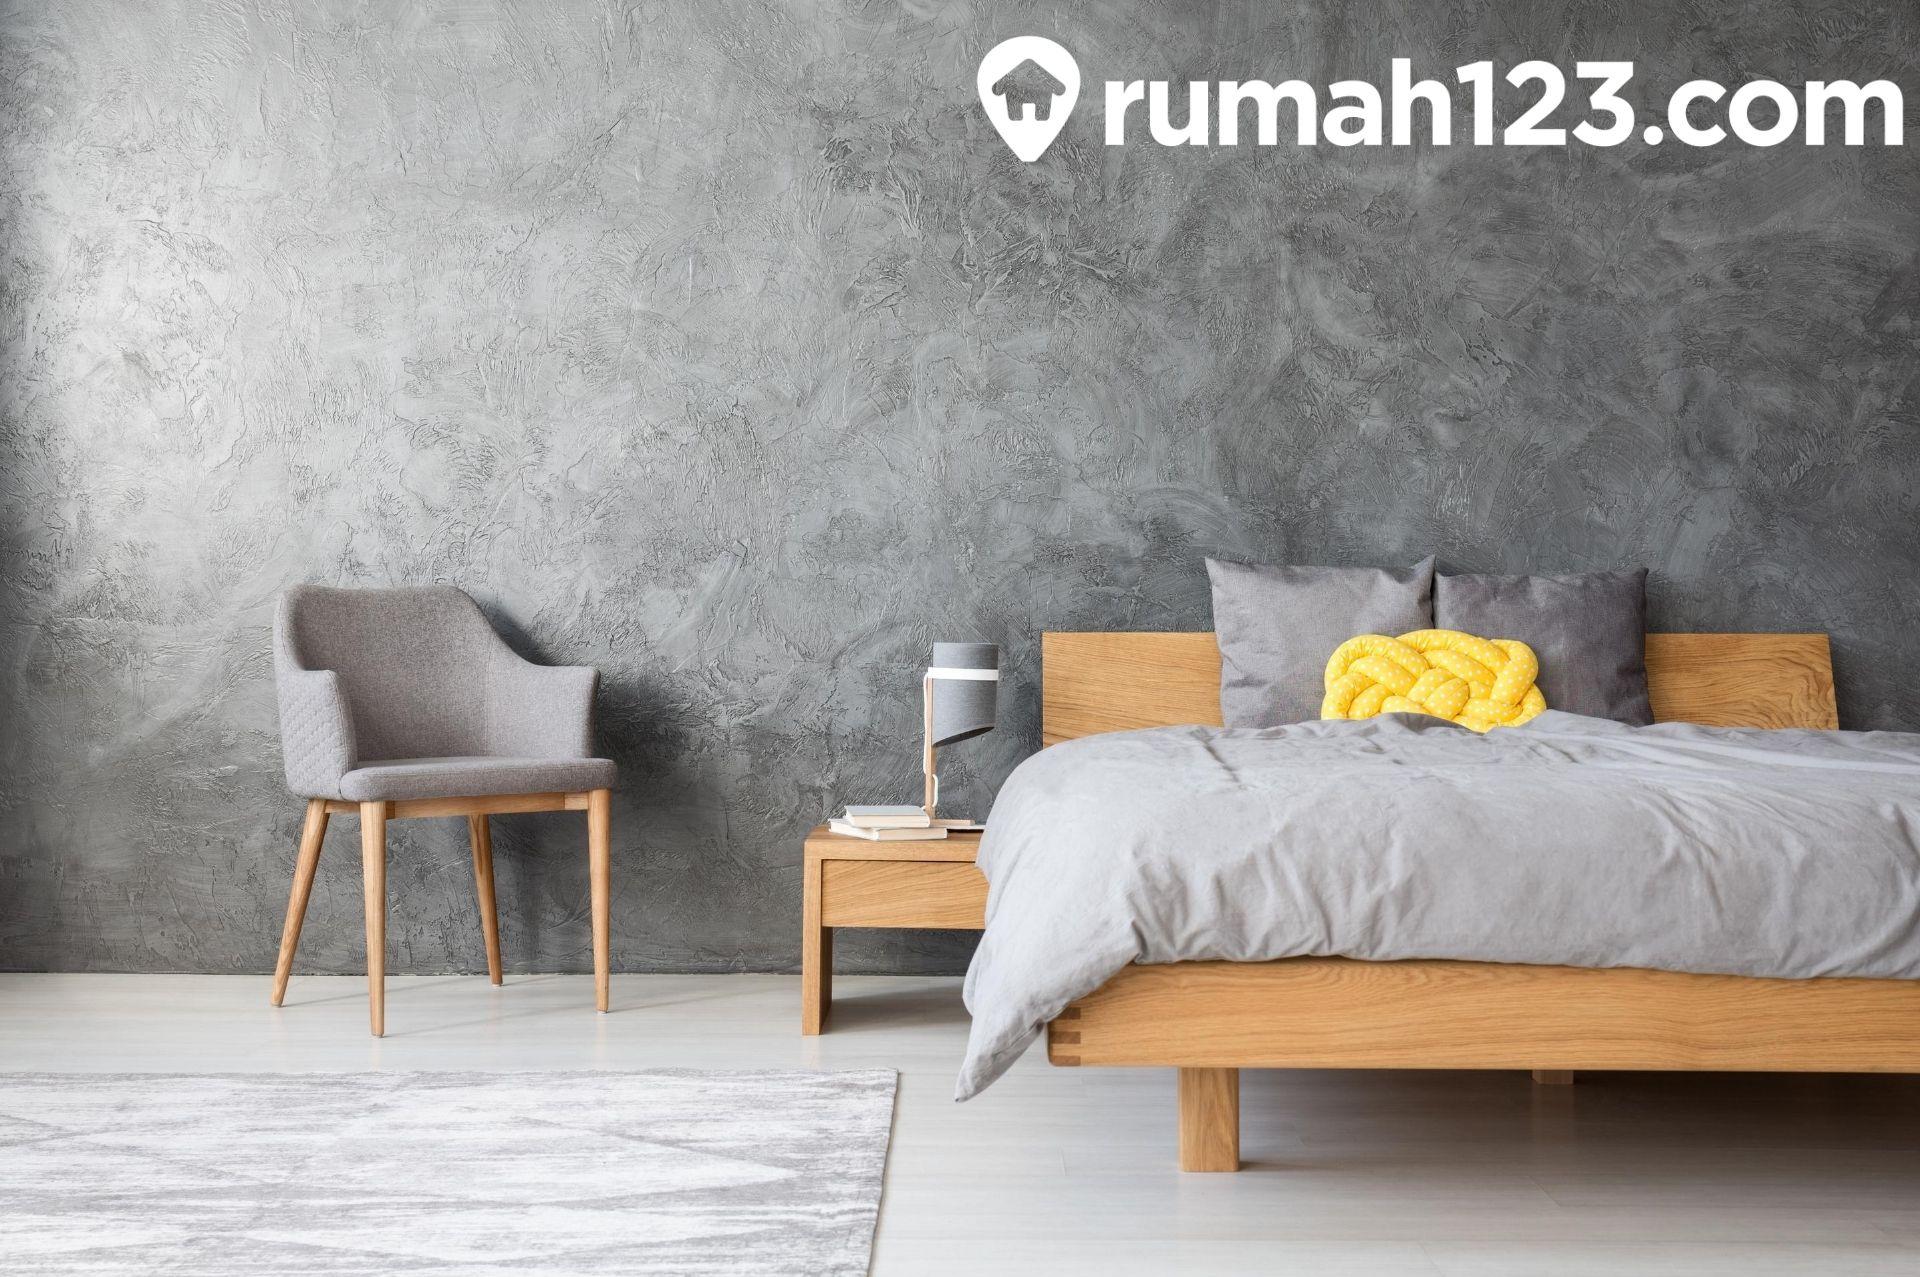 5 Desain Kamar Tidur Minimalis, Walau Kecil Tetap Kelihatan Mewah